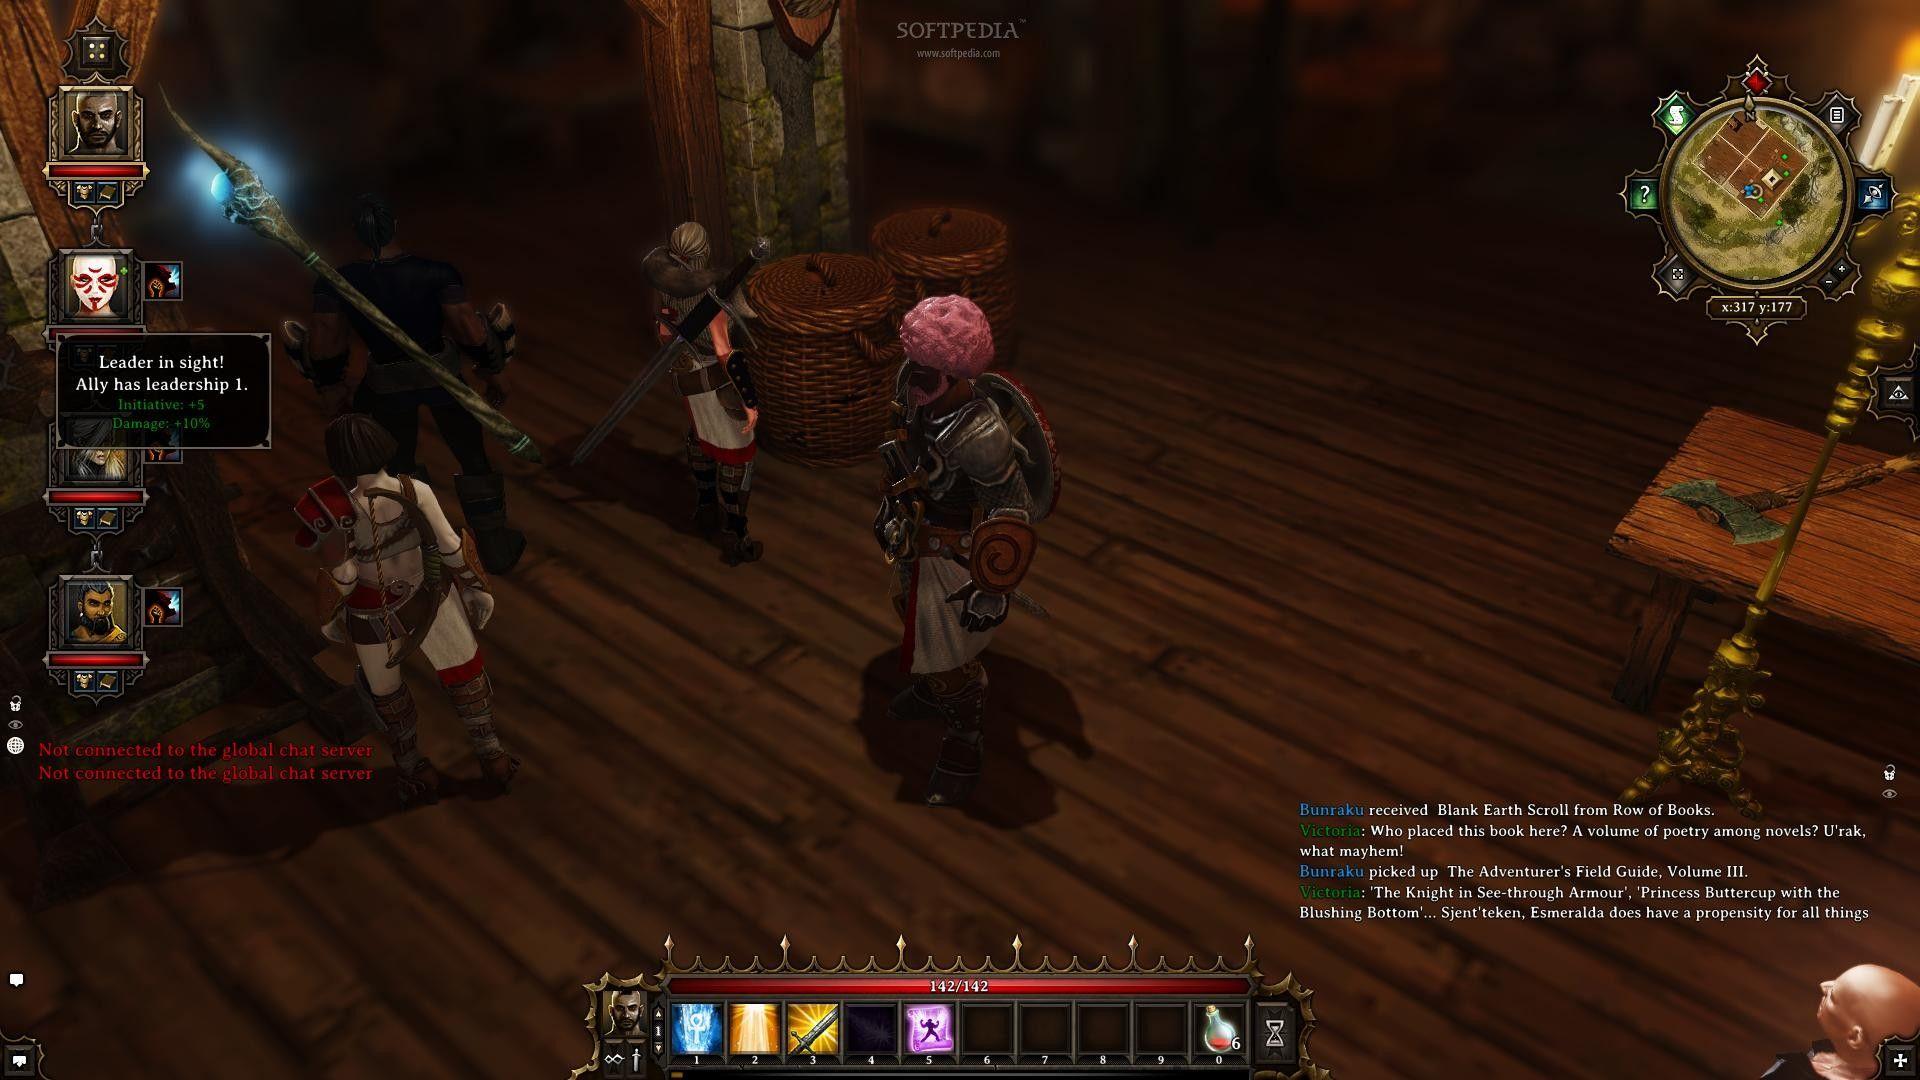 Divinity: Original Sin Developer Confirms Two More RPGs in